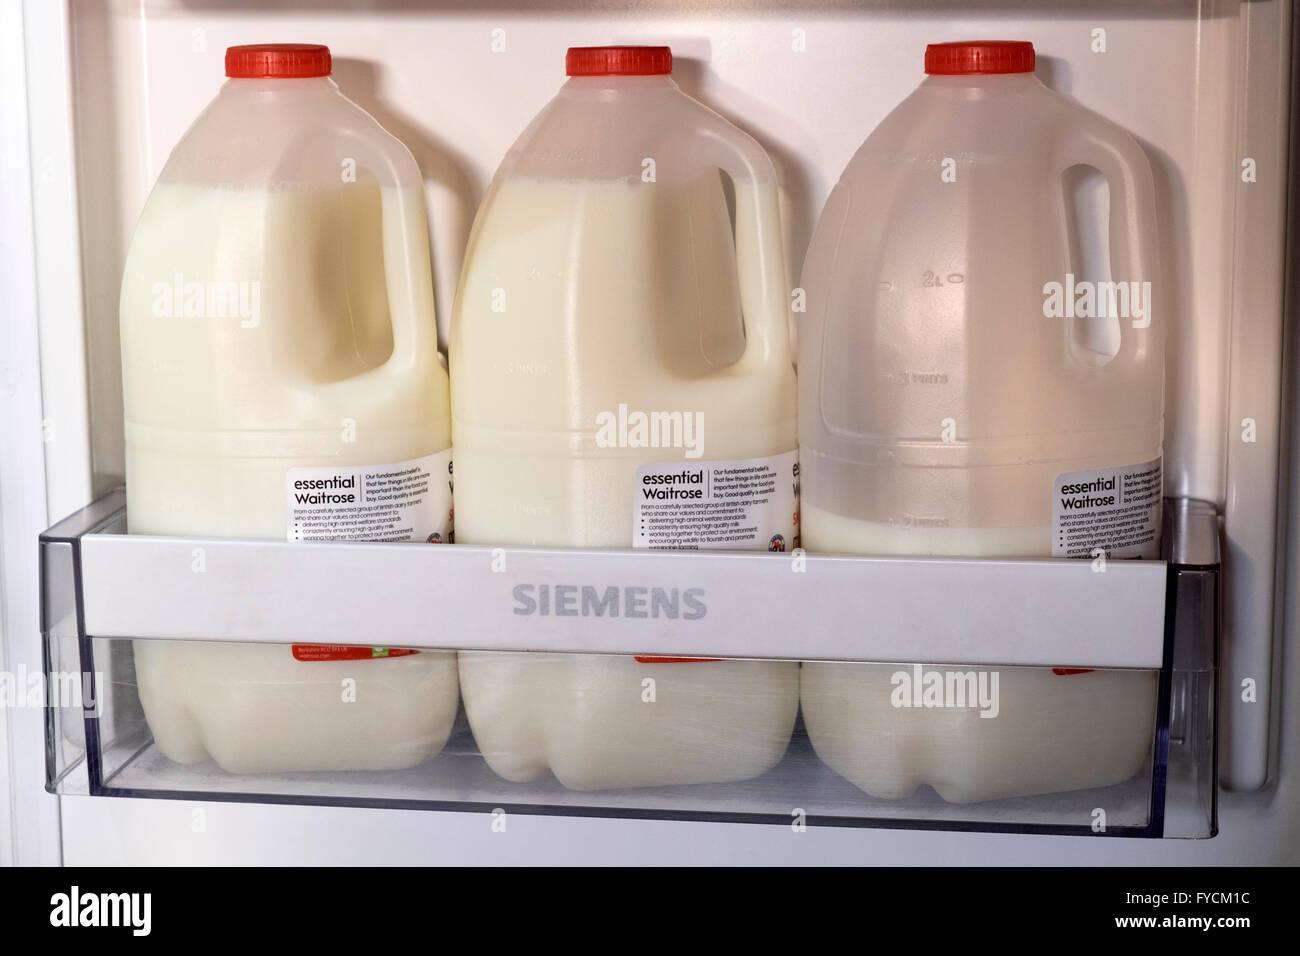 Siemens Kühlschrank : Siemens kühlschrank stockfotos siemens kühlschrank bilder alamy